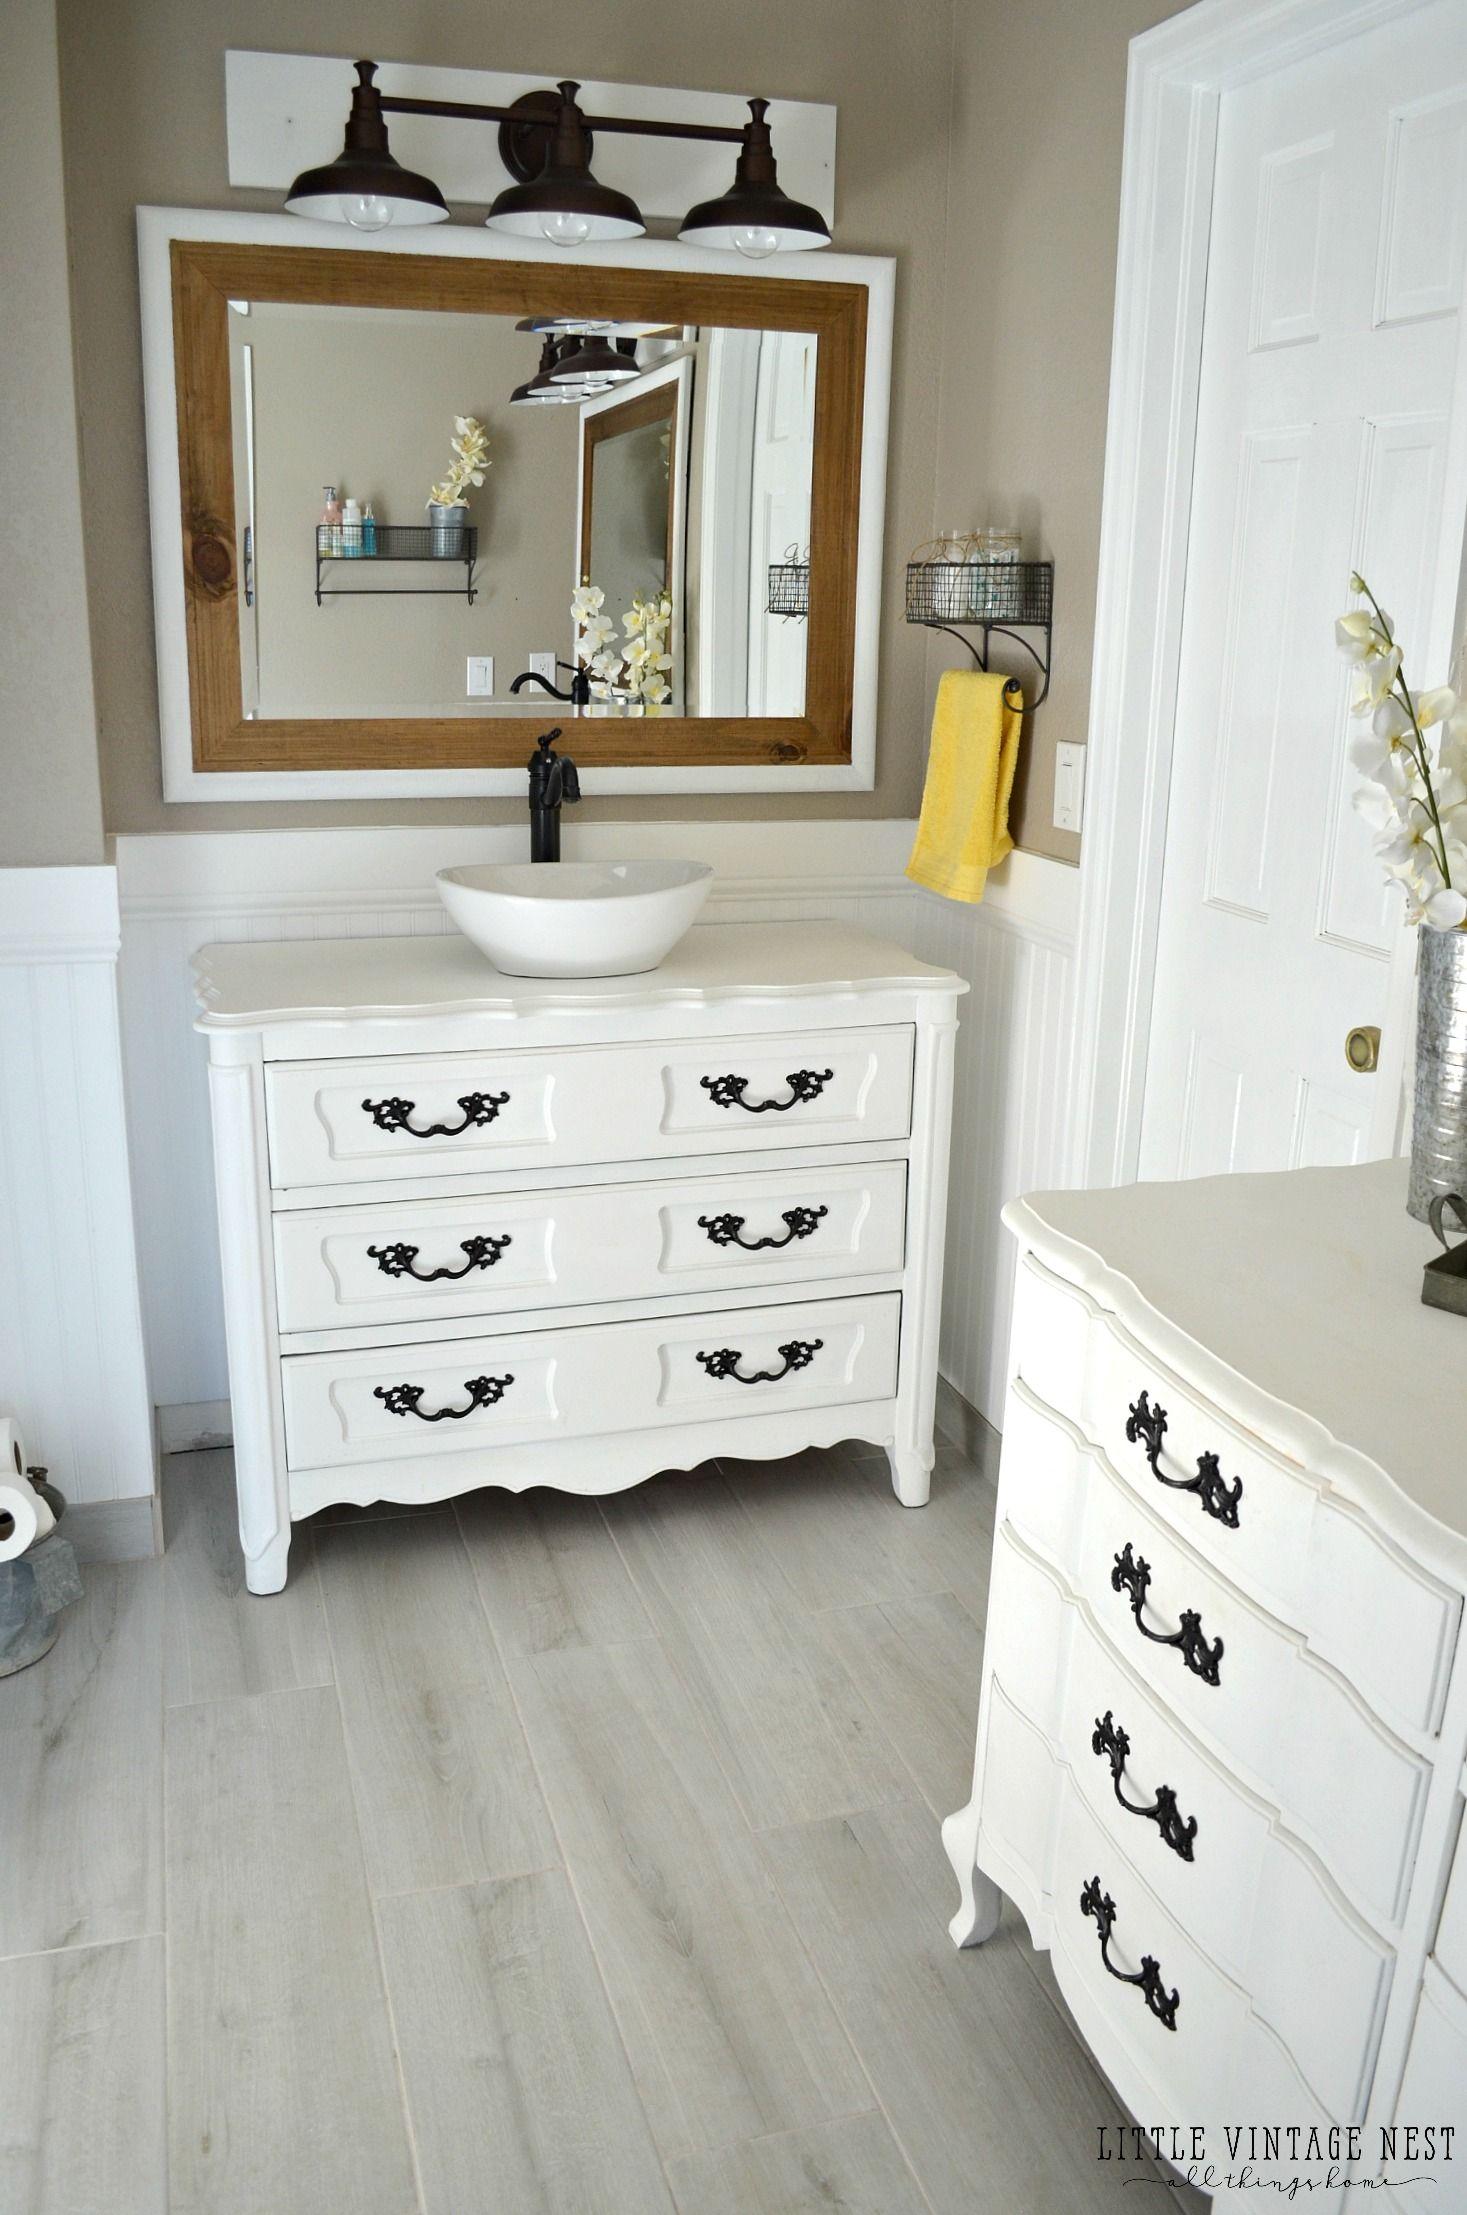 Etonnant Step By Step Tutorial To Turn An Old Dresser Into Bathroom Vanity More